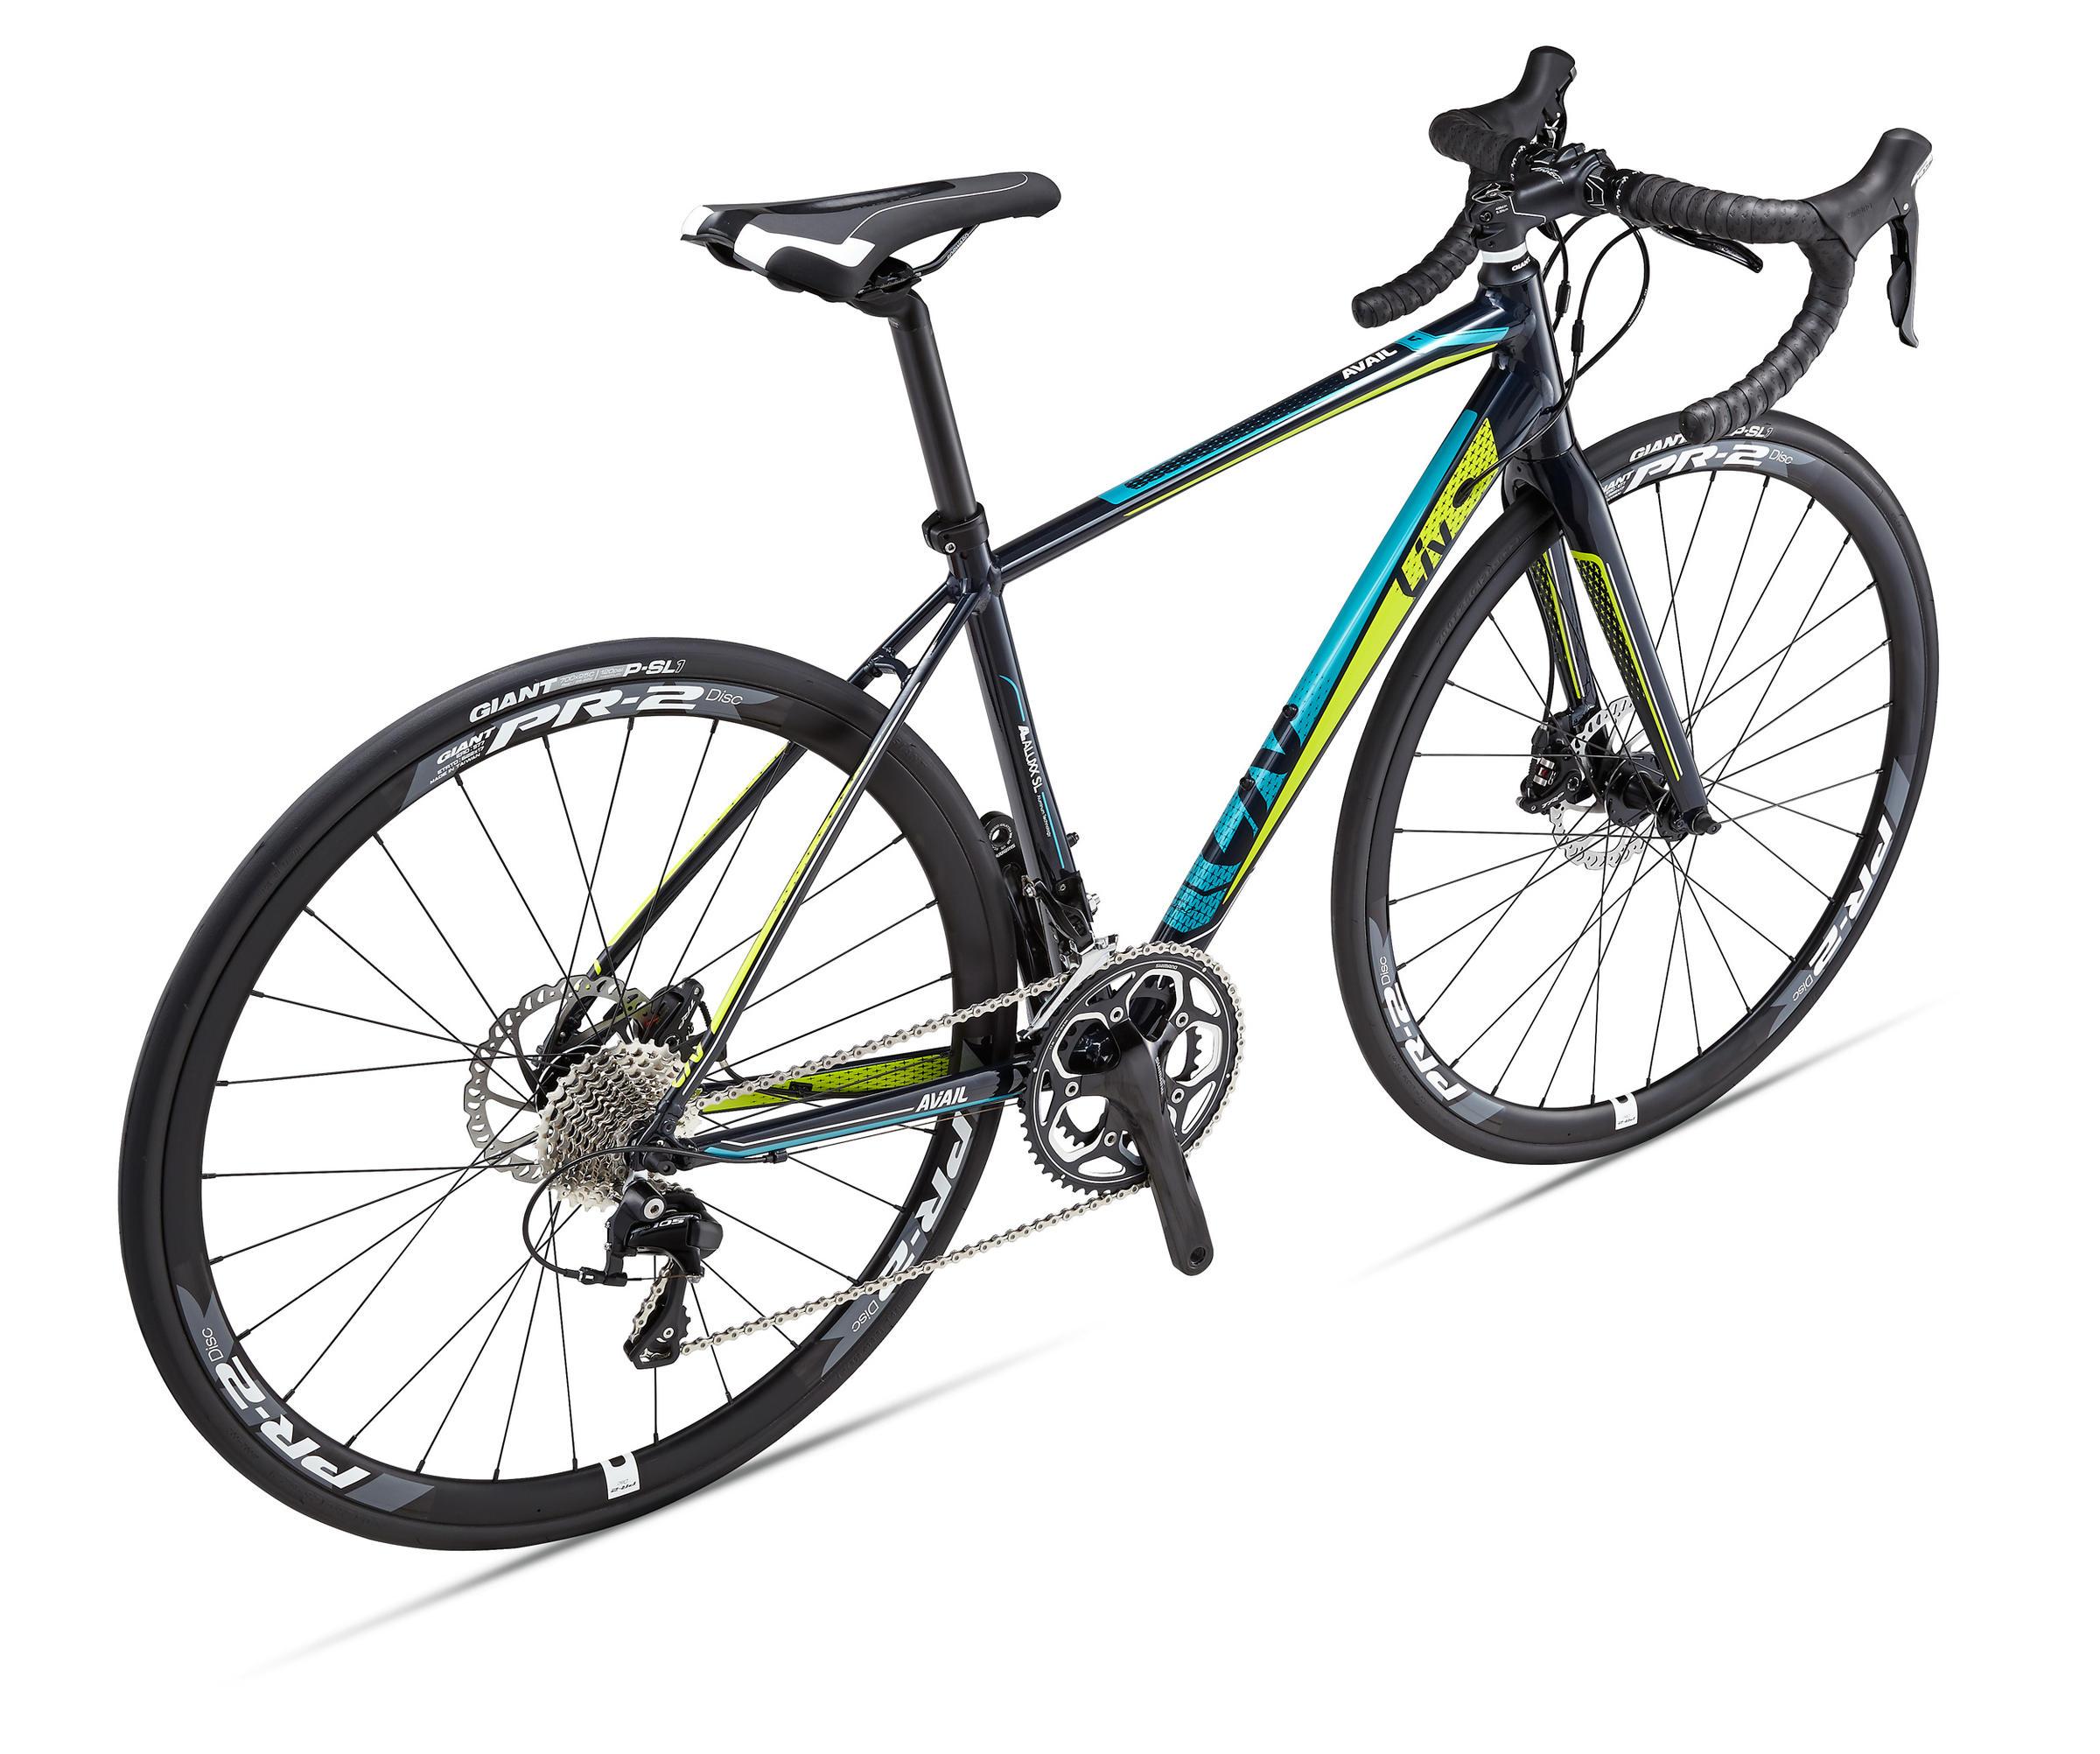 3b577f1538e Liv Avail 1 Disc - Women's - Wheel World Bike Shops - Road Bikes, Mountain  Bikes, Bicycle Parts and Accessories. Parts & Bike Closeouts!